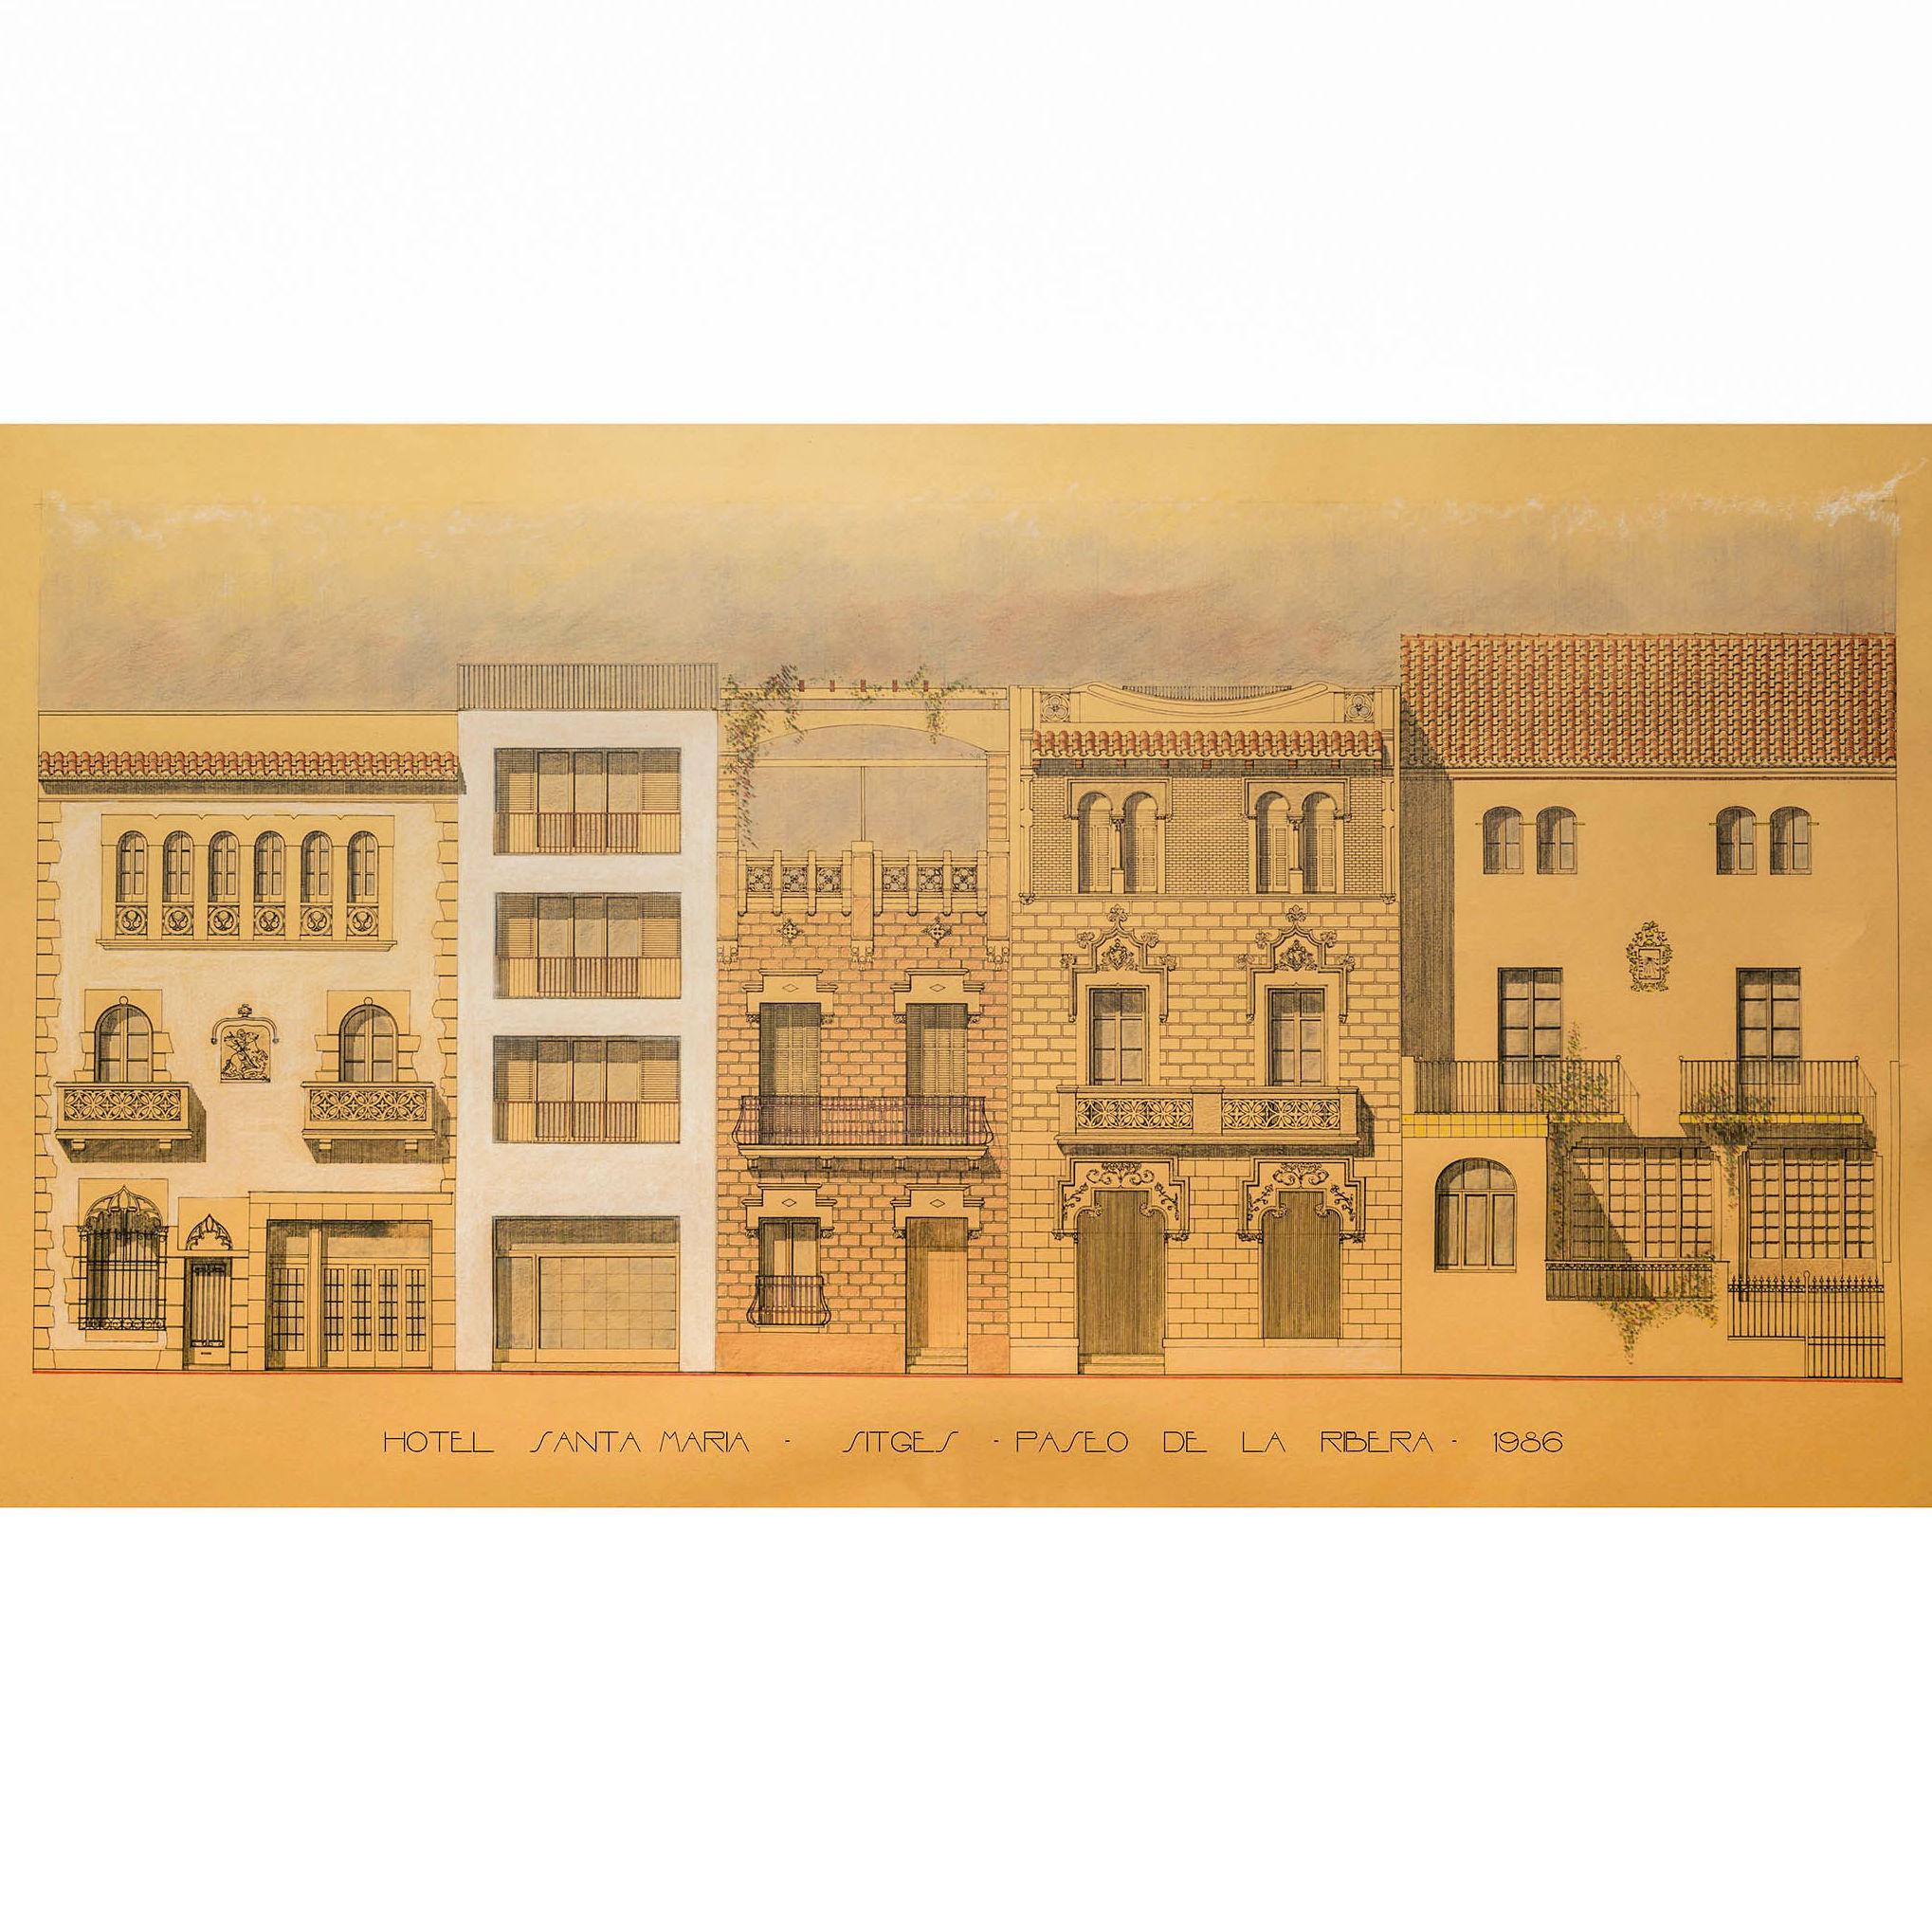 Hotel Santa Maria   #paseodelaribera #sitges #fpmarquitectura #1986 #acuarela watercolor